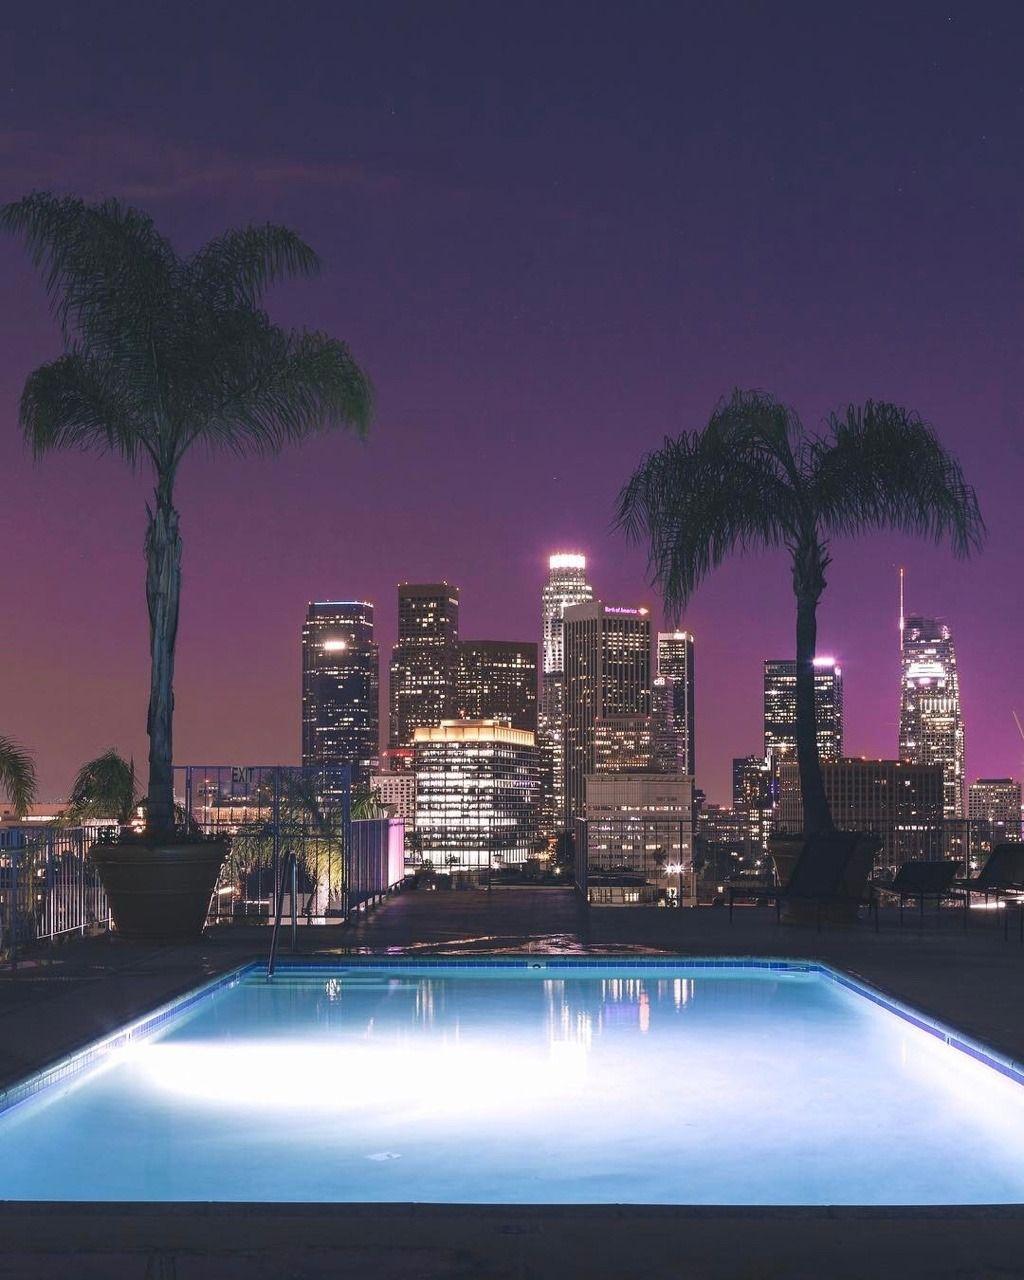 Los Angeles California by Sttephen | CaliforniaFeelings.com #california #cali #LA #CA #SF